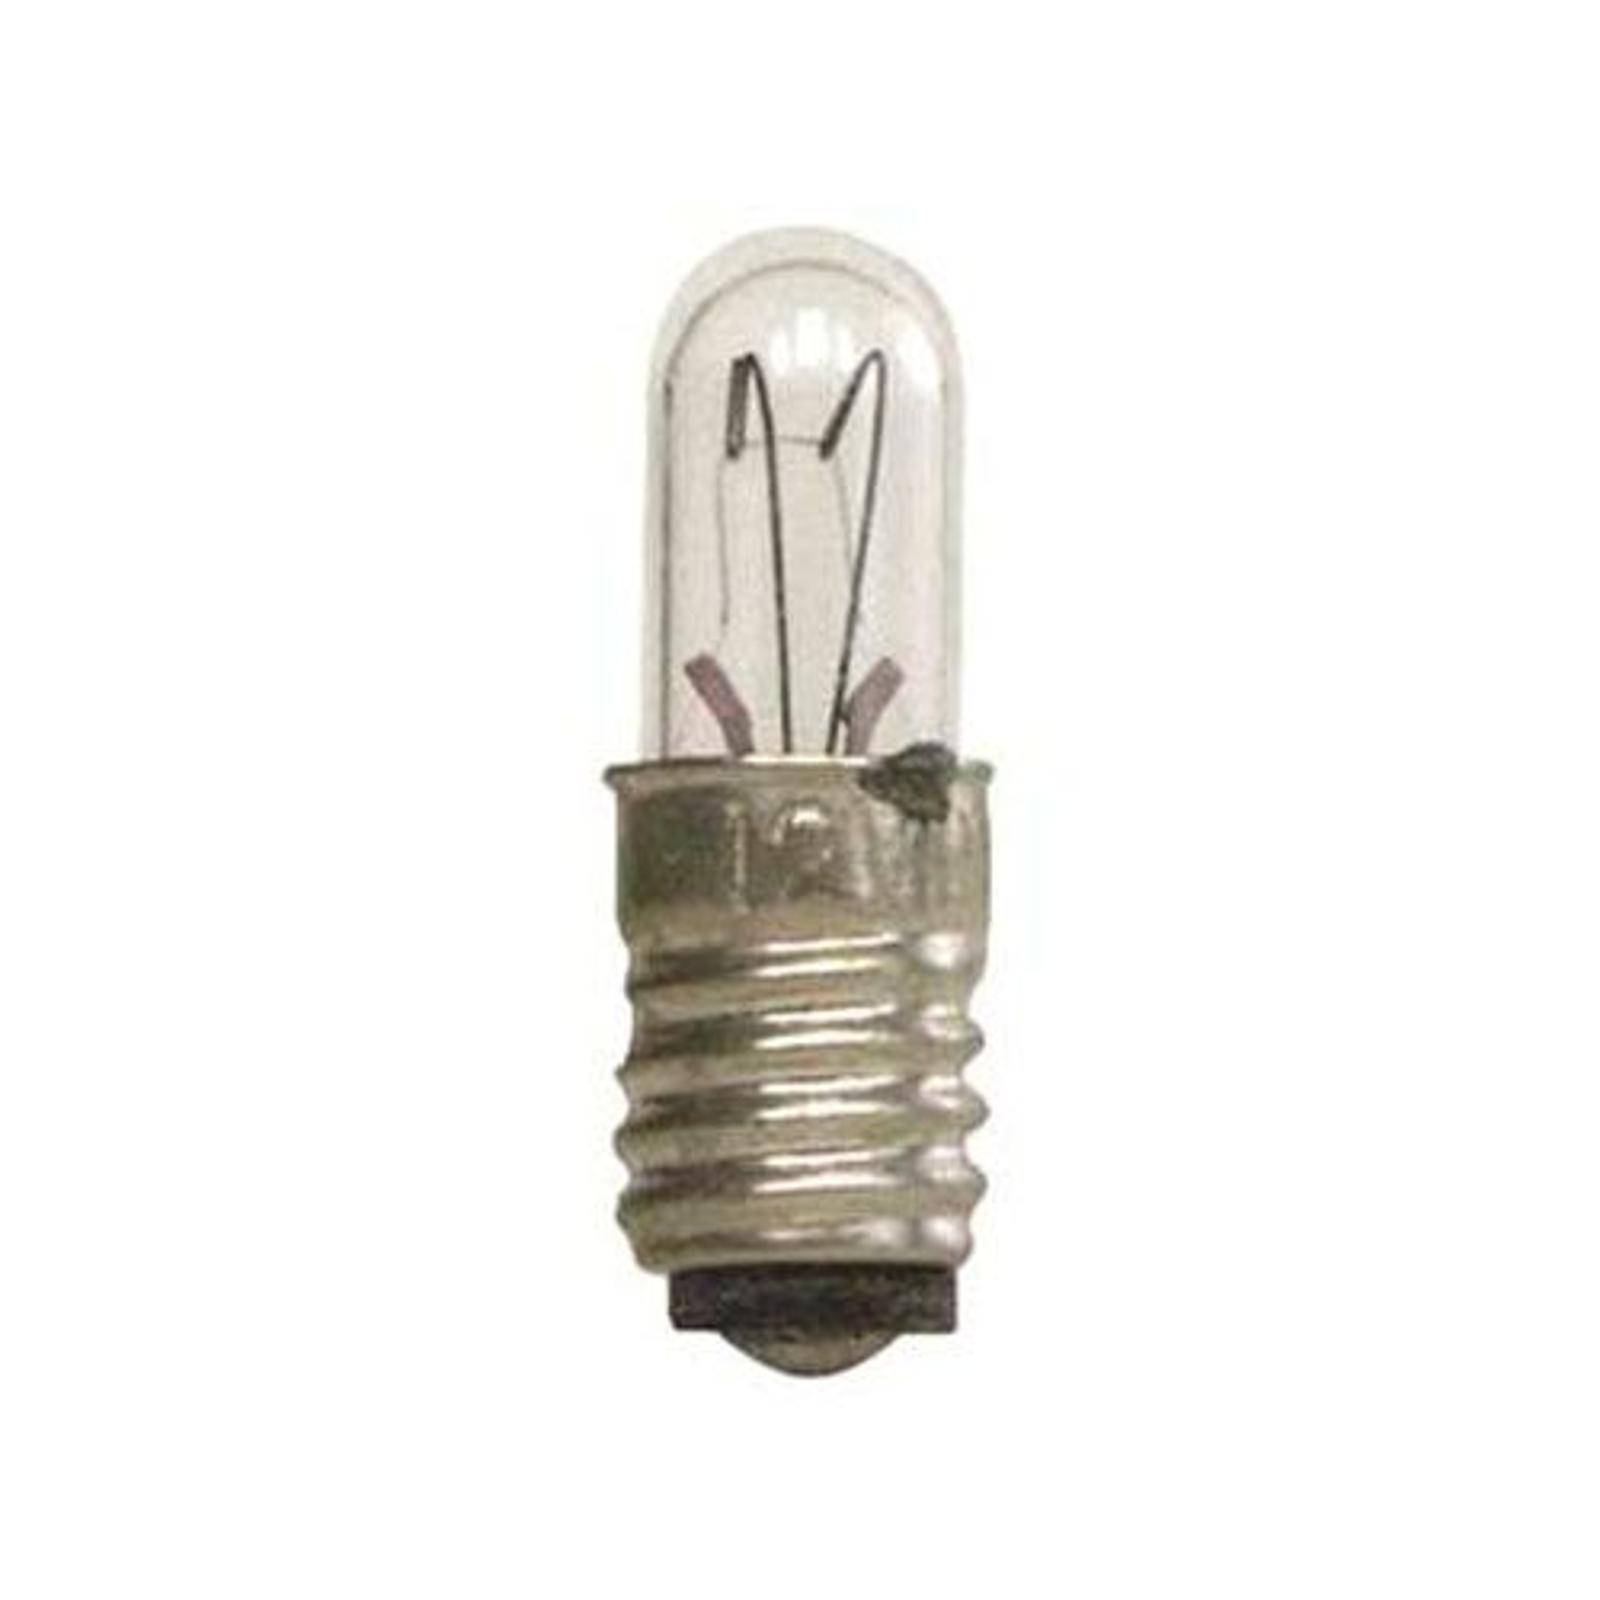 E5 0,4W 12V varalamput 5-lampun pakkaus, kirkas